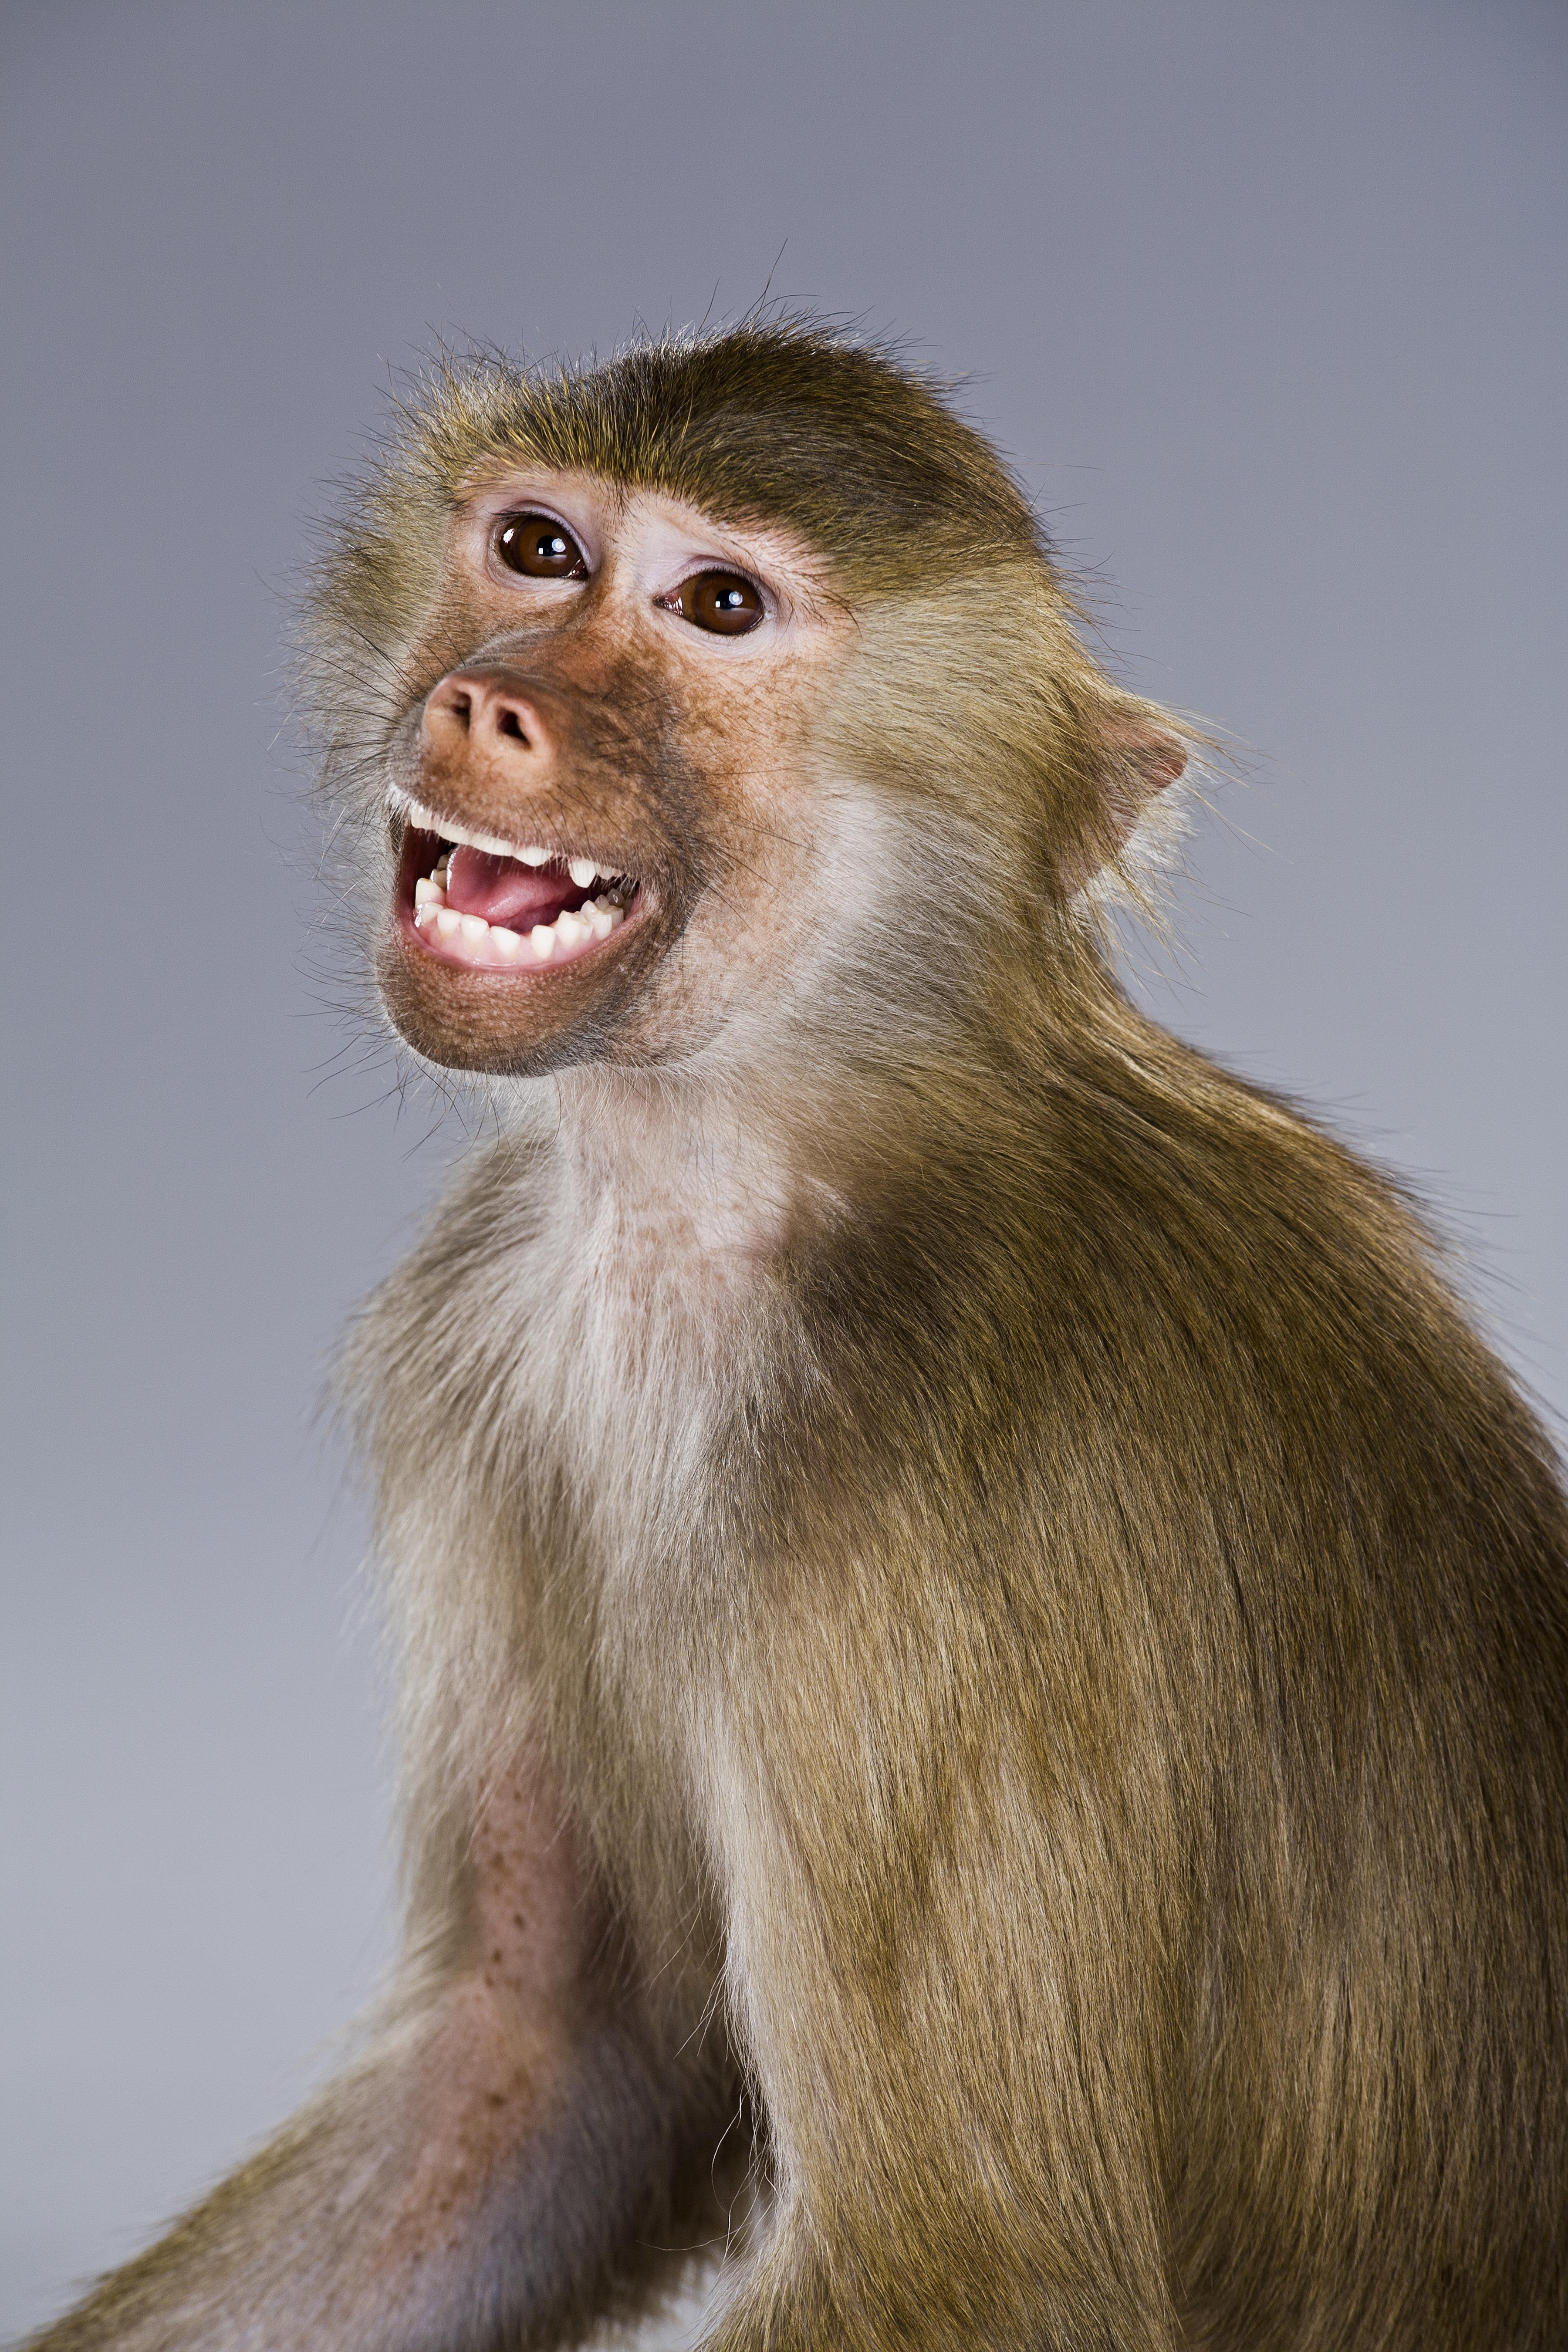 Baboon smiling, Papio Hamadryas